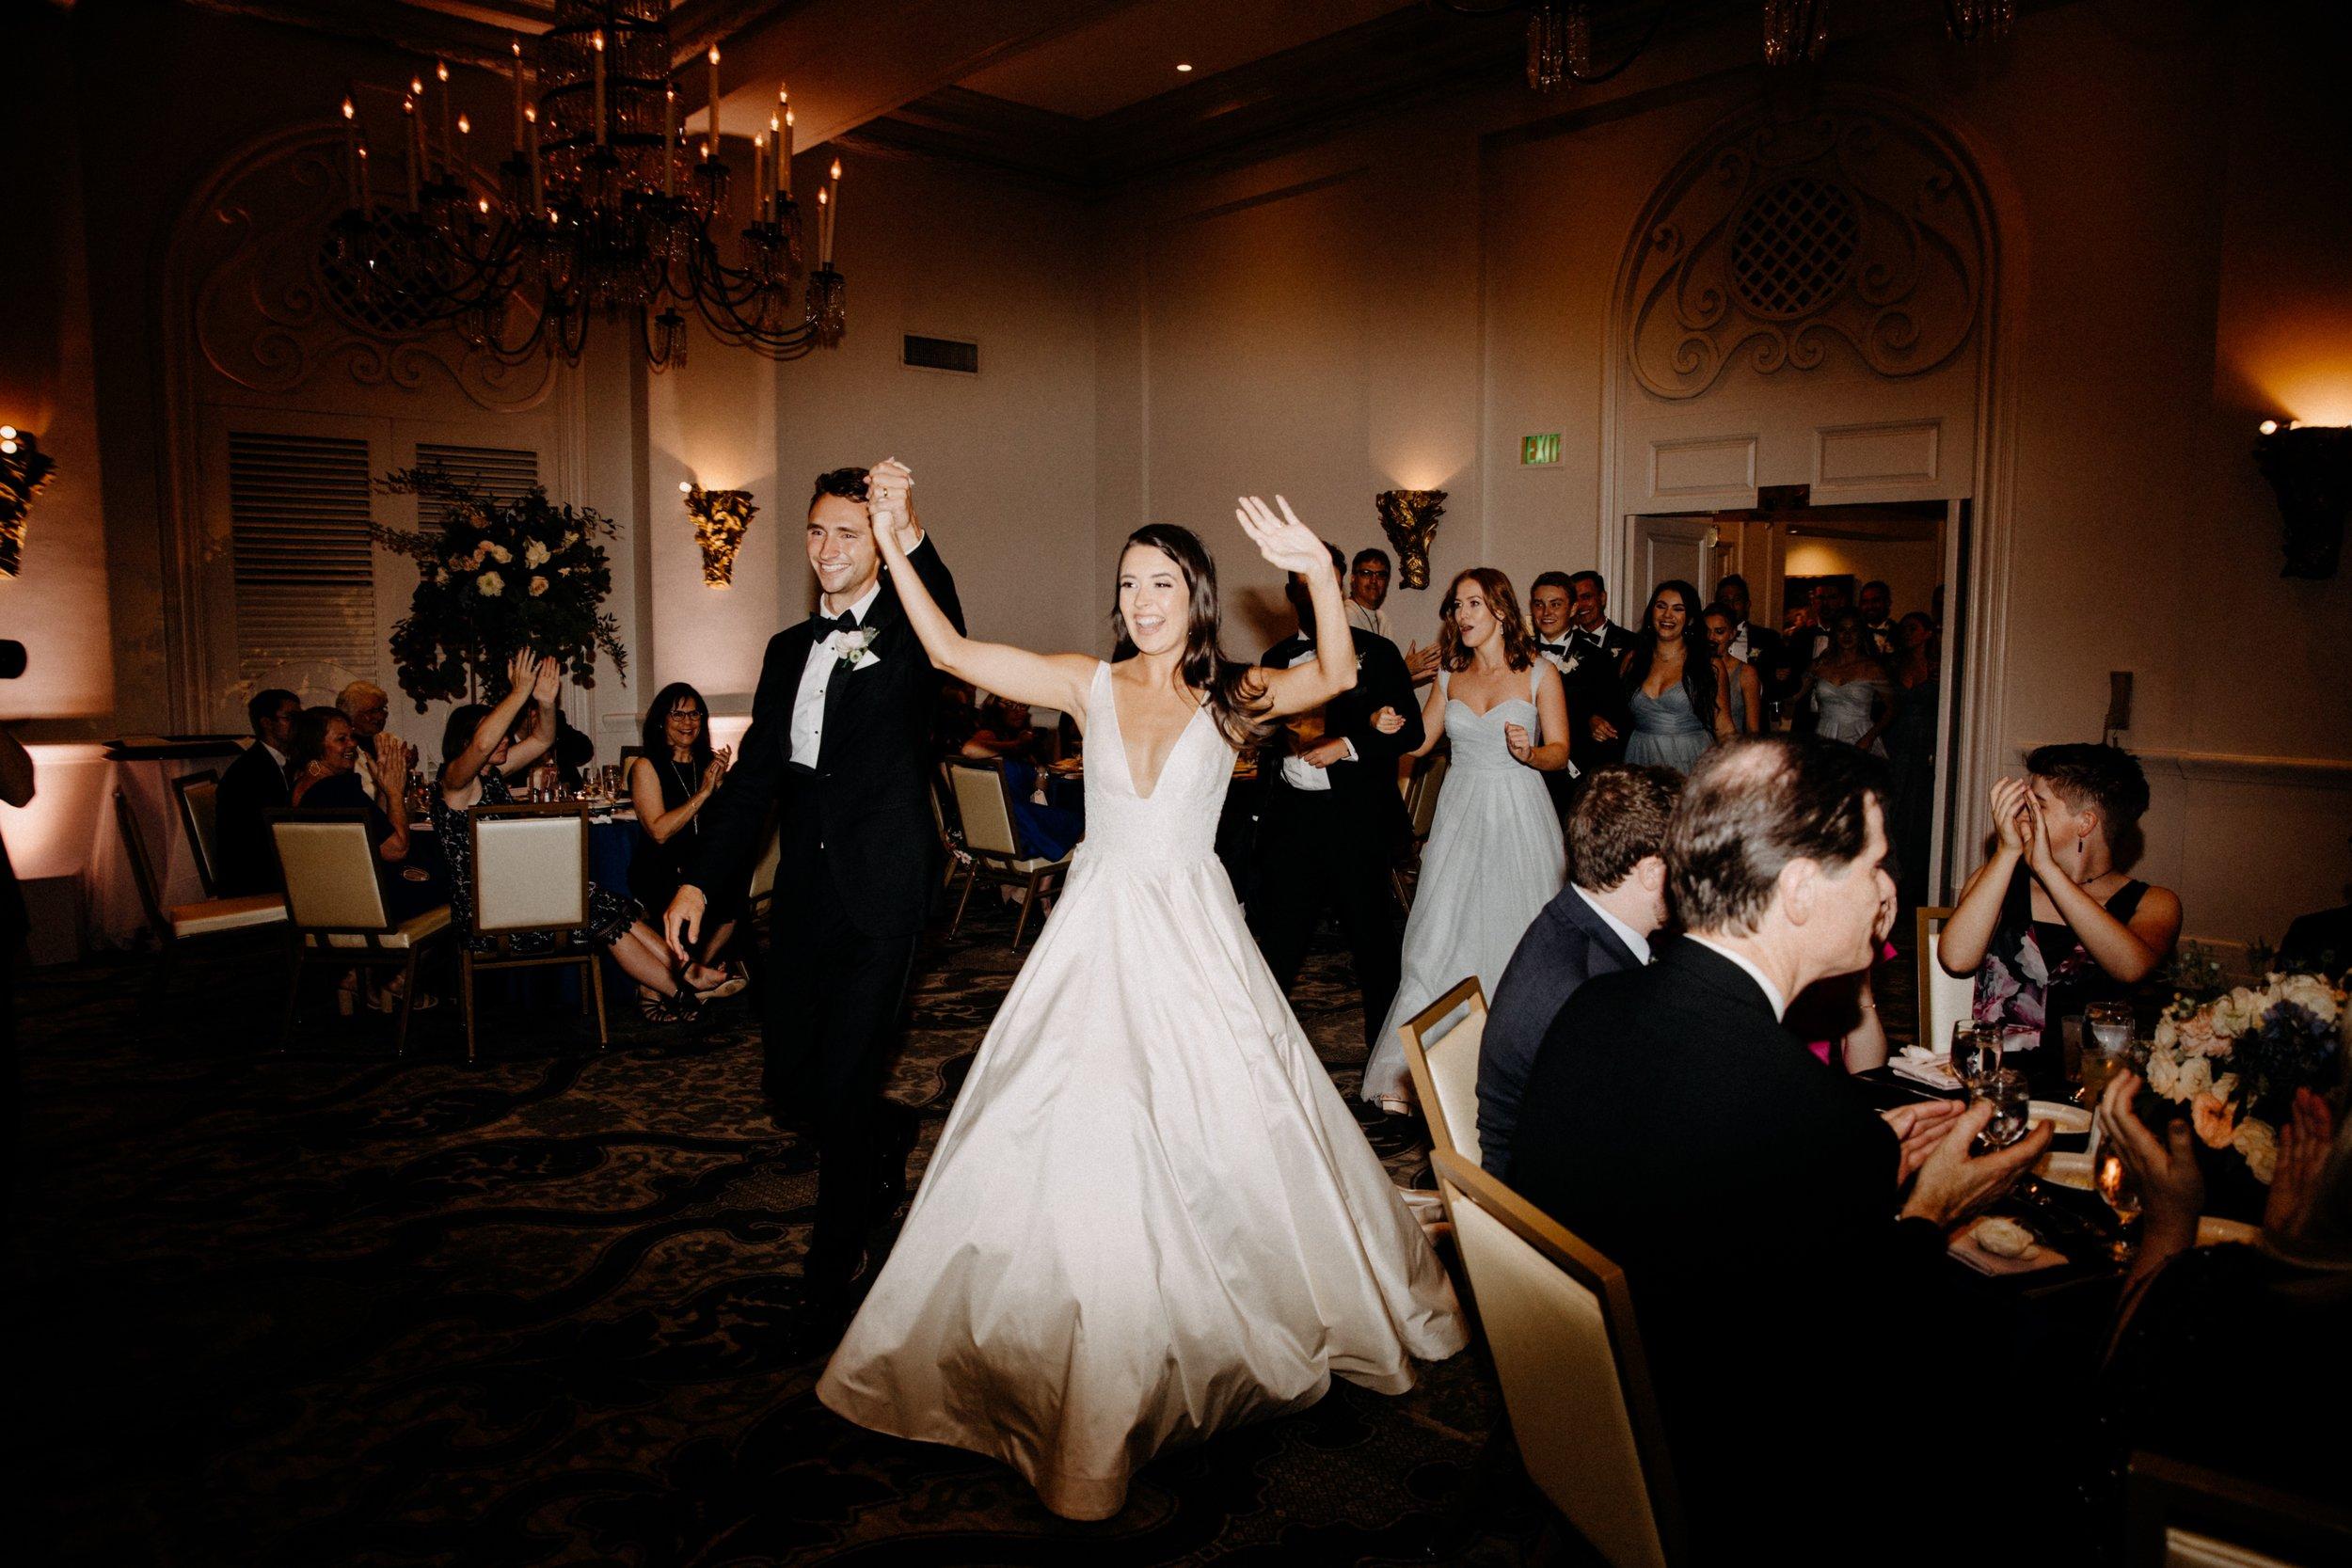 st-anthony-hotel-wedding-photography-10130san-antonio.JPG